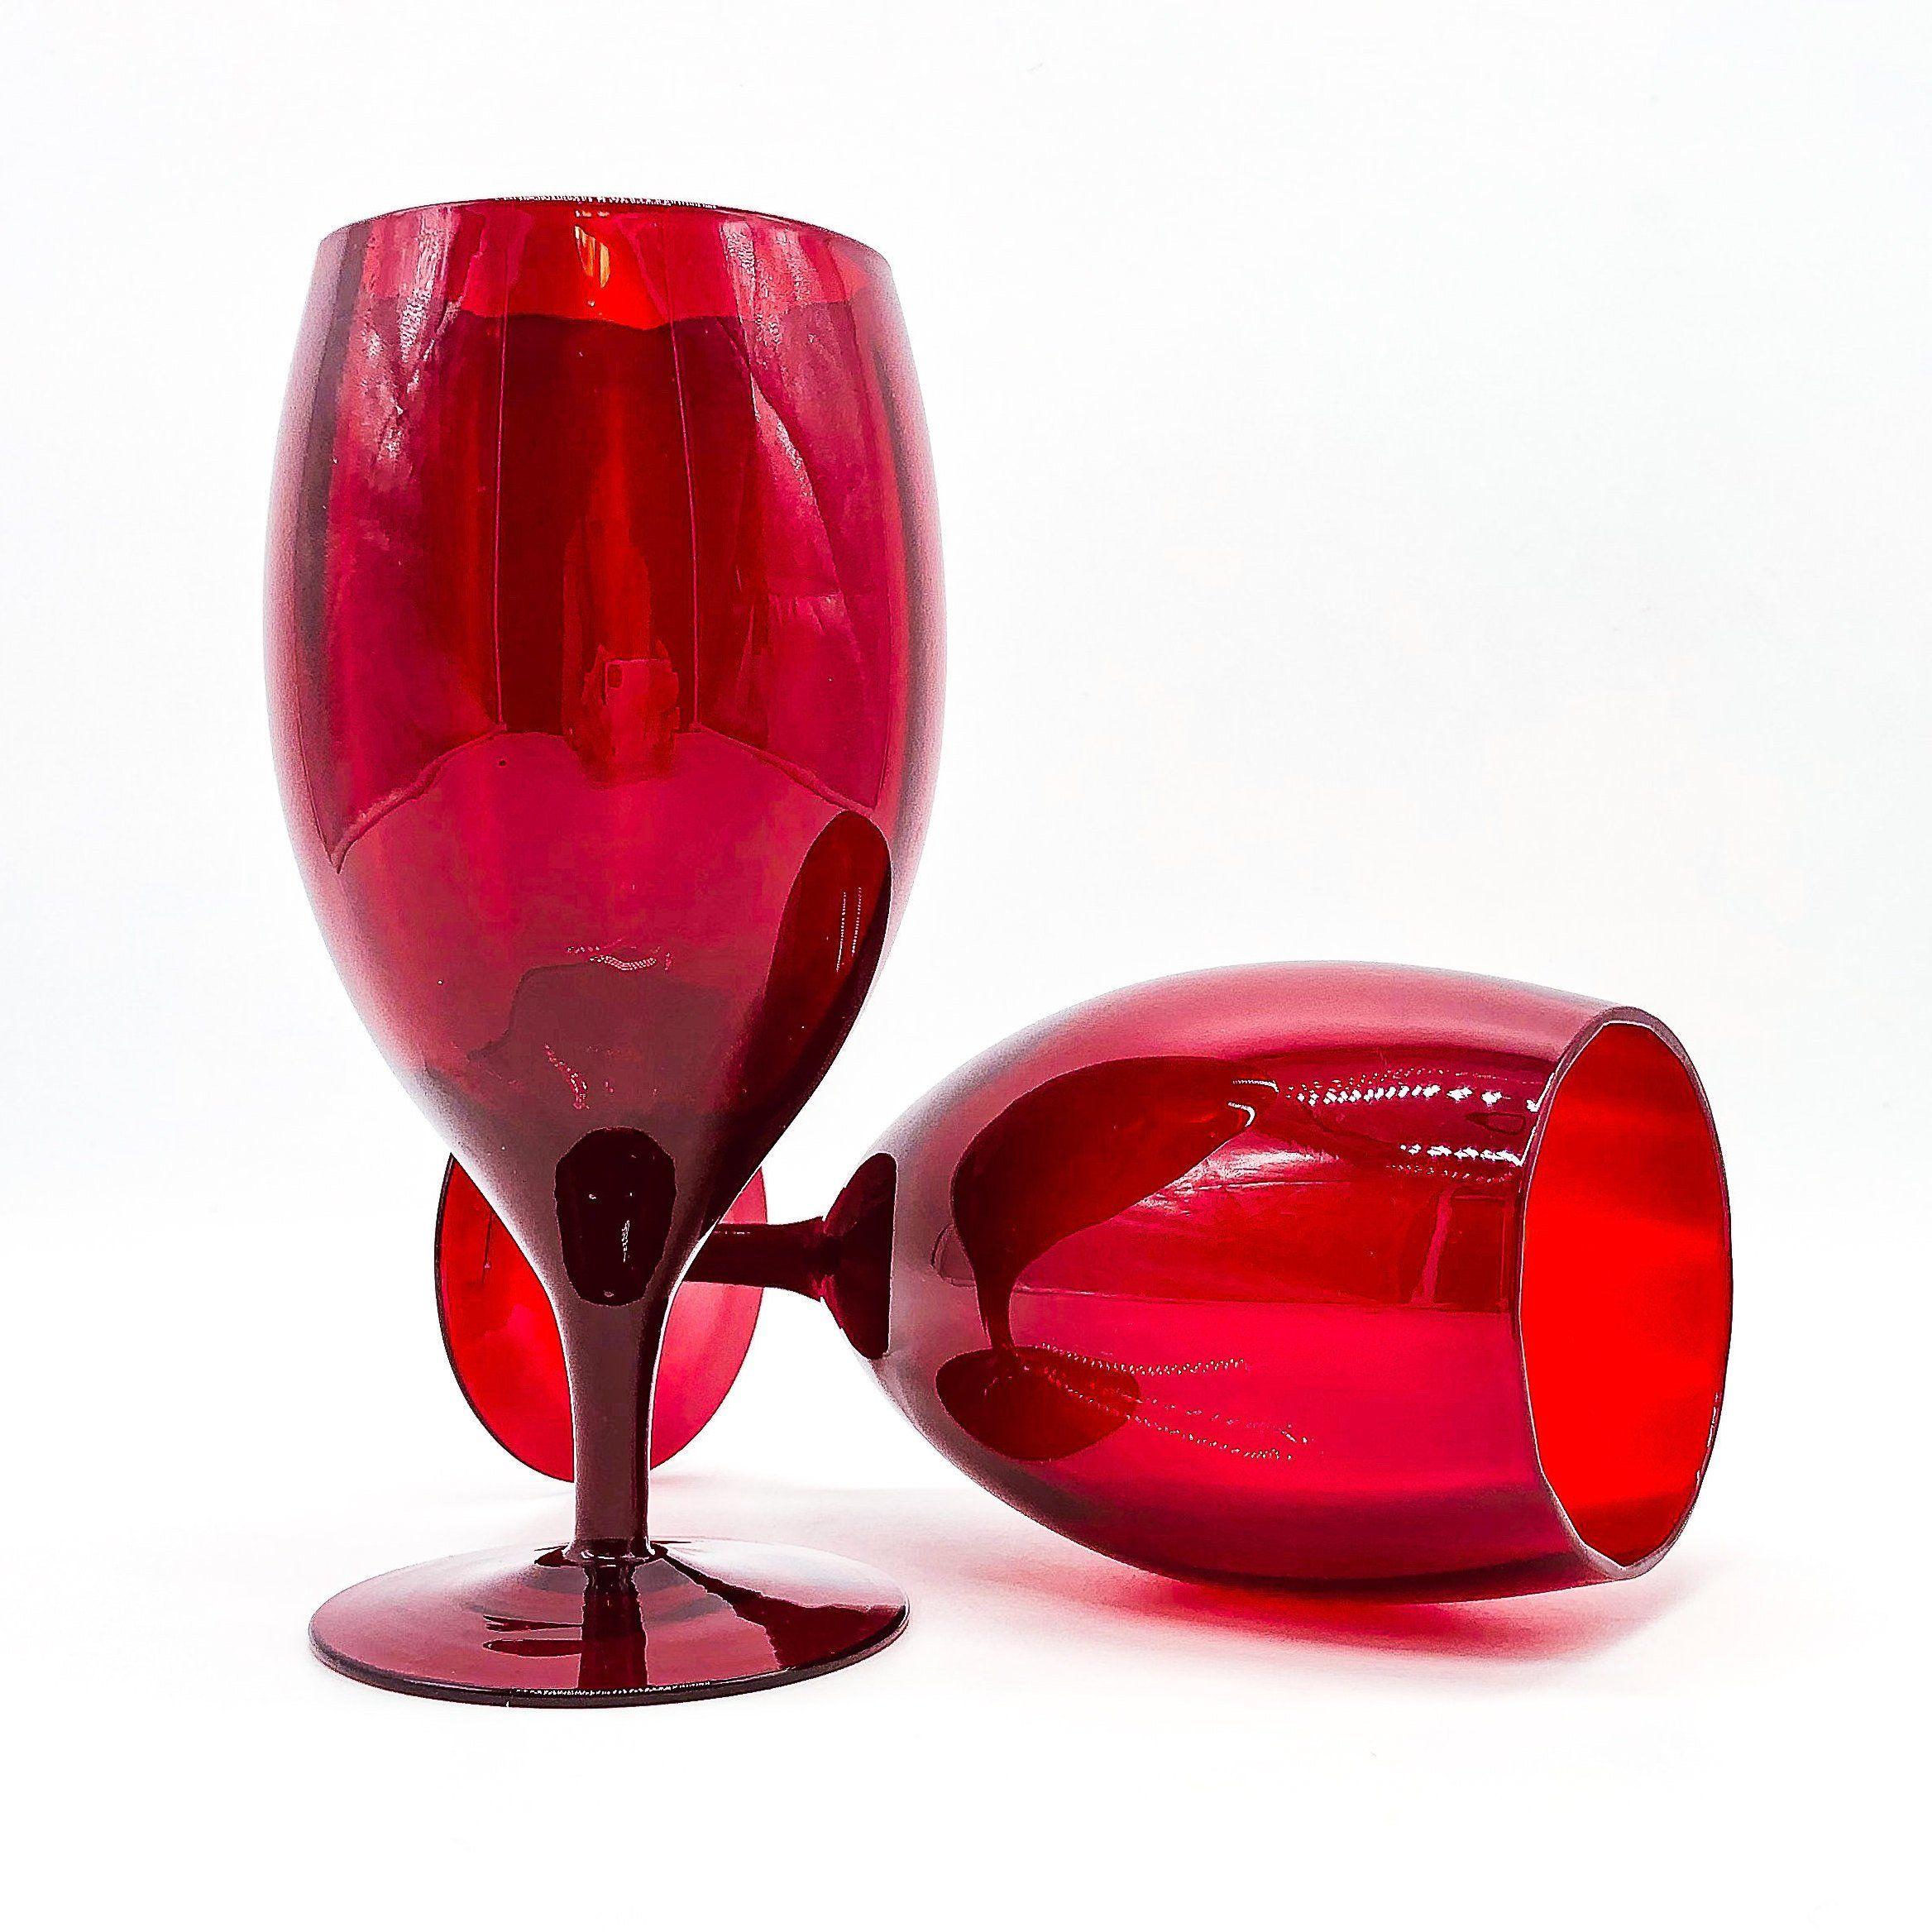 Empoli Goblets Ruby Red Italian Optic Wine Glasses By Thehouseofnostalgia On Etsy Empoli Vintageglassware Rubyredglass Vintage Glassware Goblet Empoli